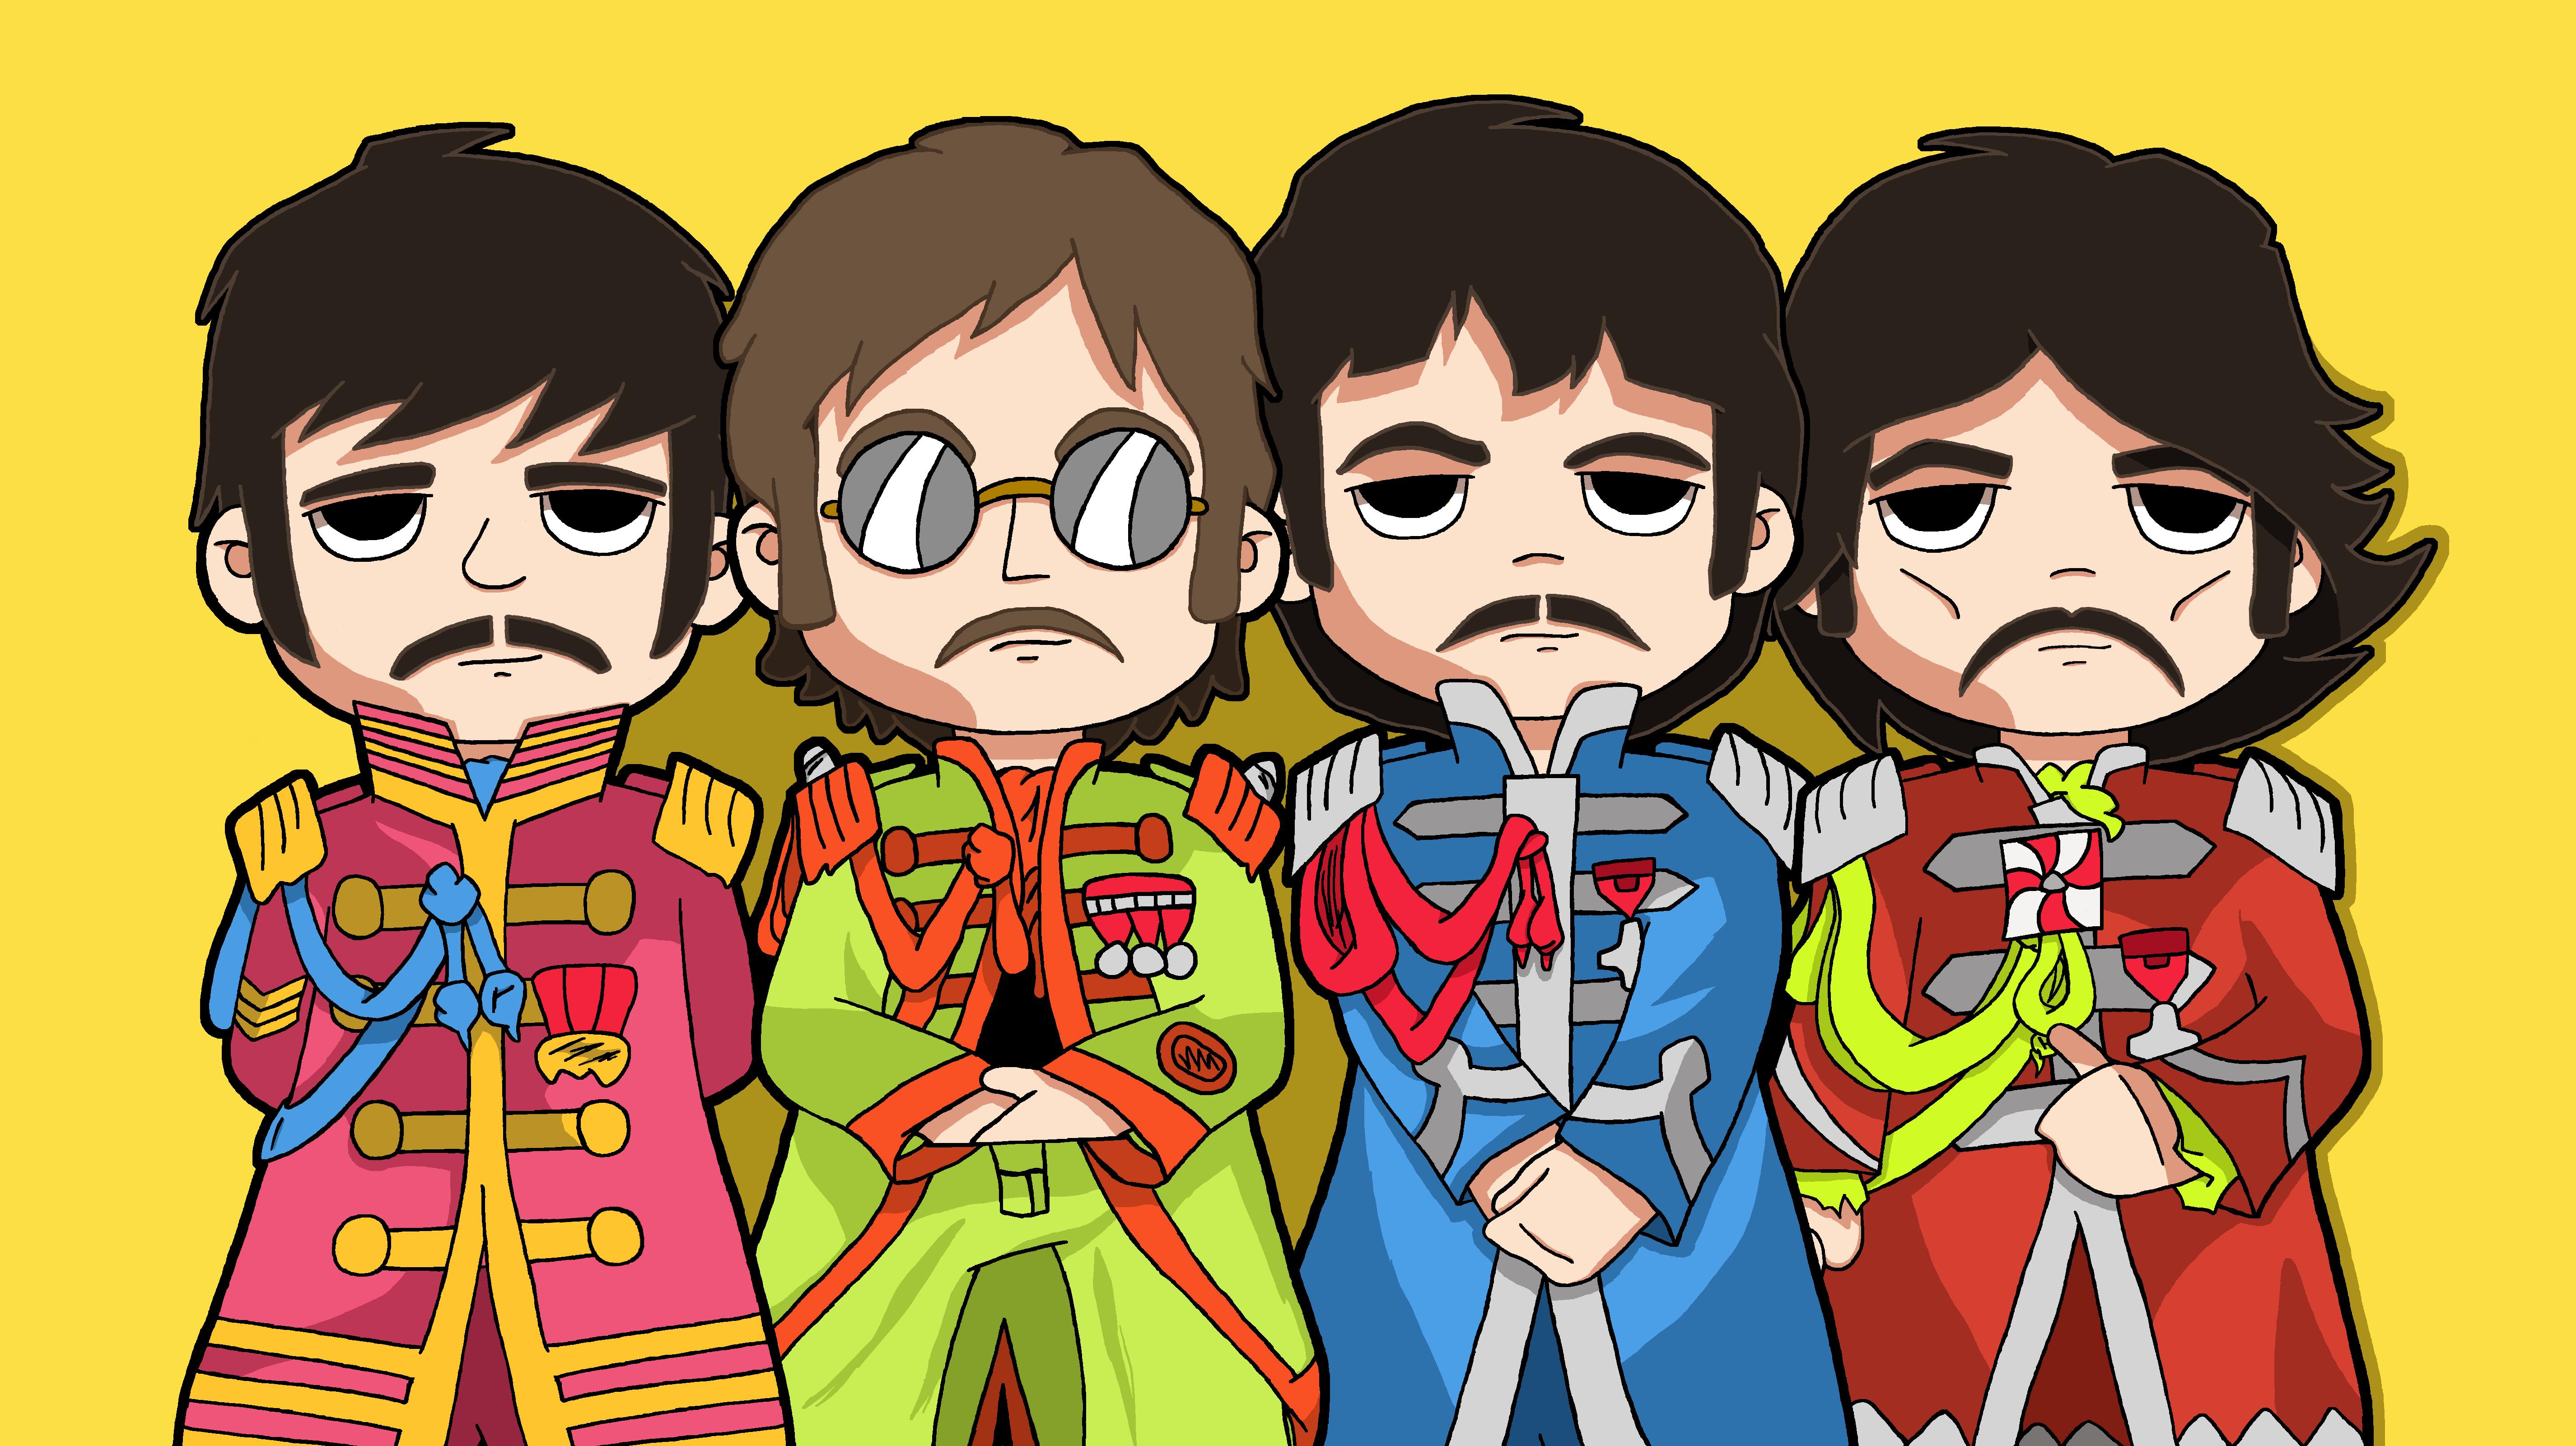 Sgt Pepper Wallpapers - Wallpaper Cave